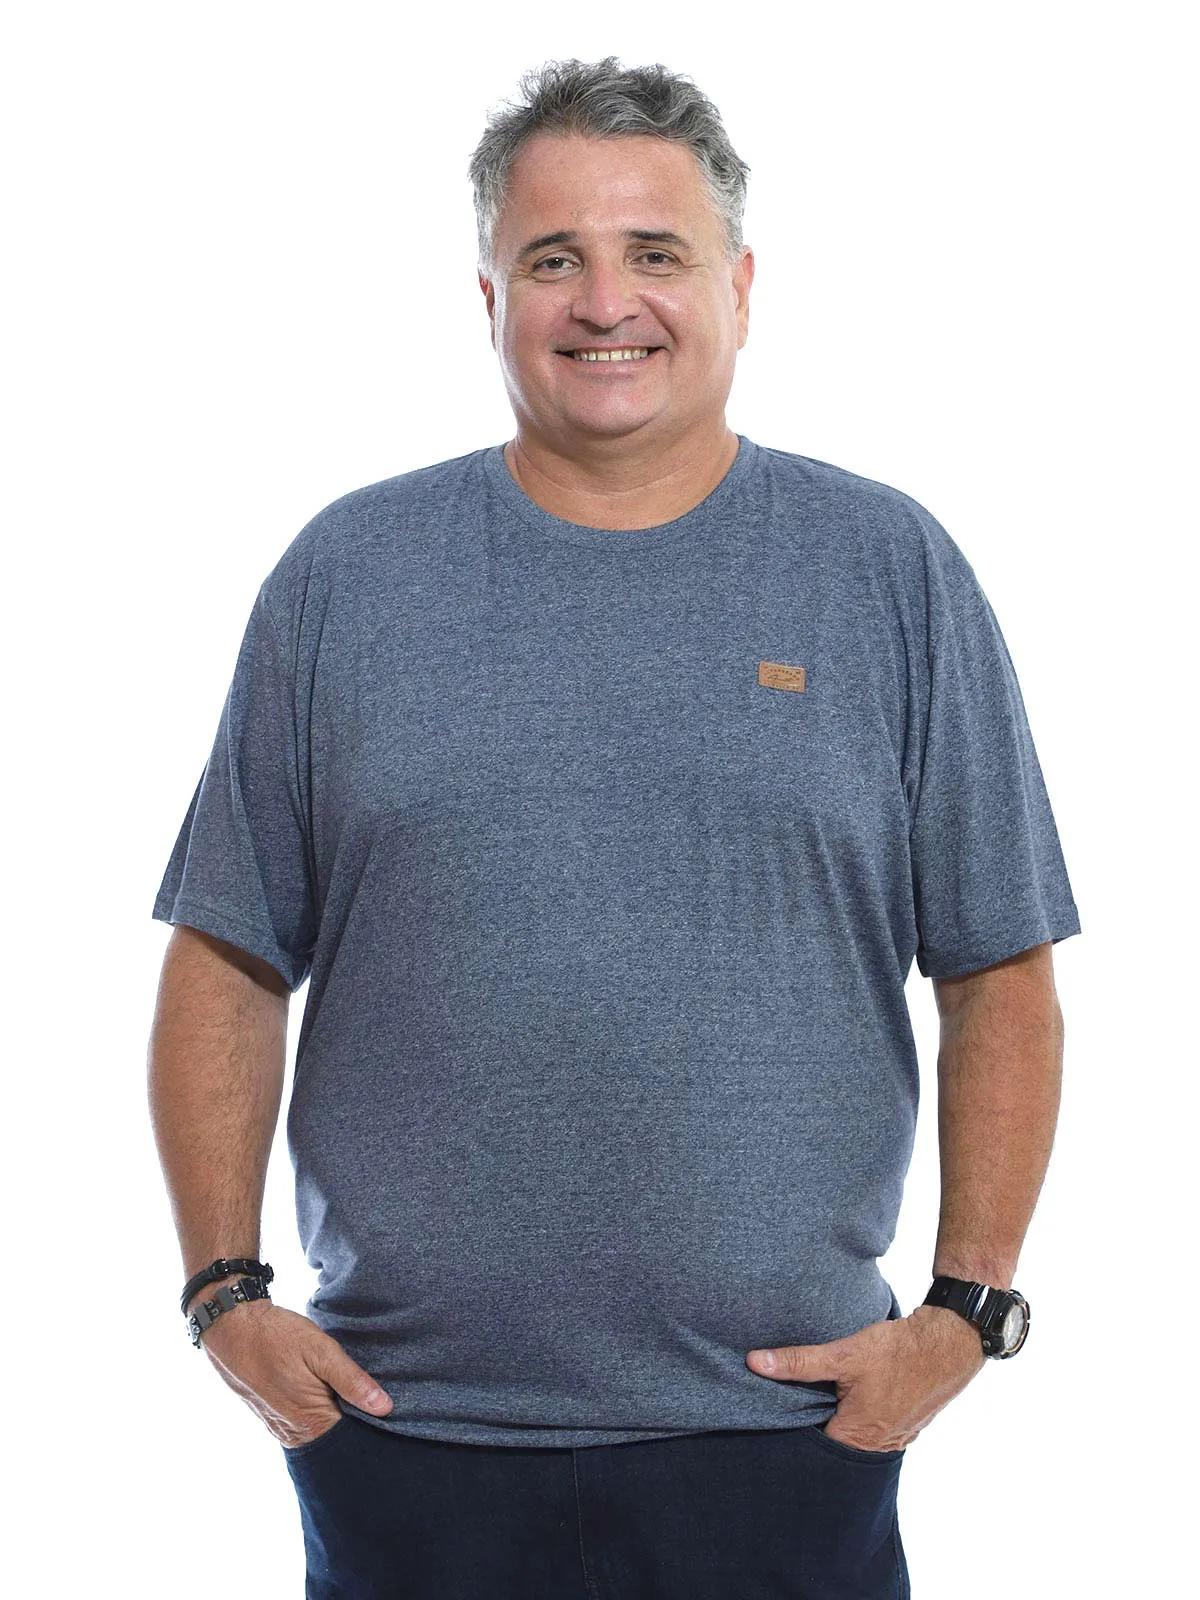 Camiseta Plus Size Masculina Manga Curta Mouline Mescla Marinho